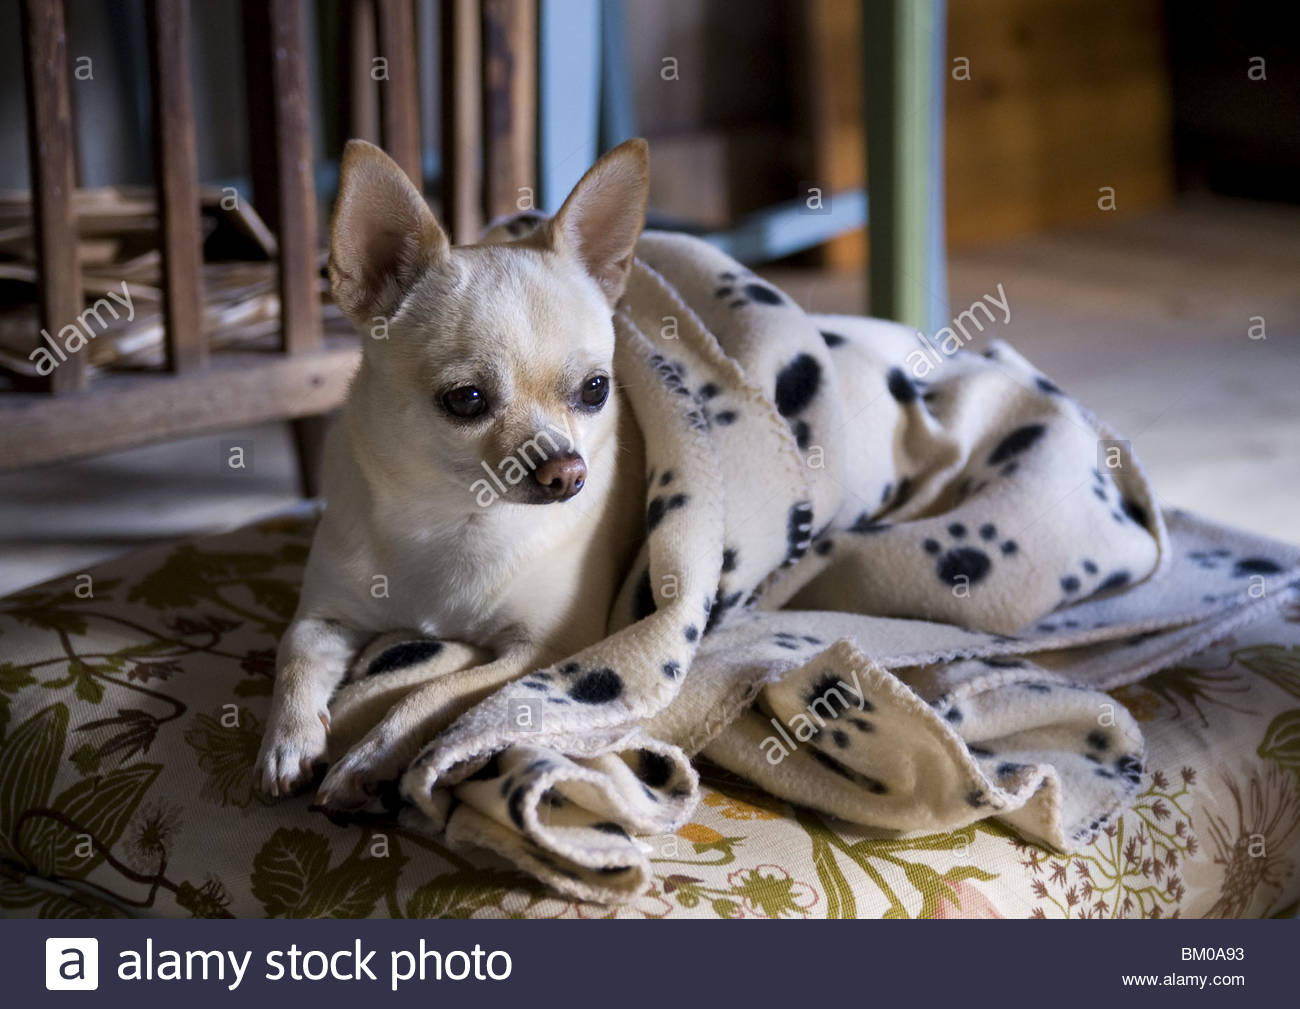 A Chihuahua Dog Laying On A Pillow Stock Photo Alamy